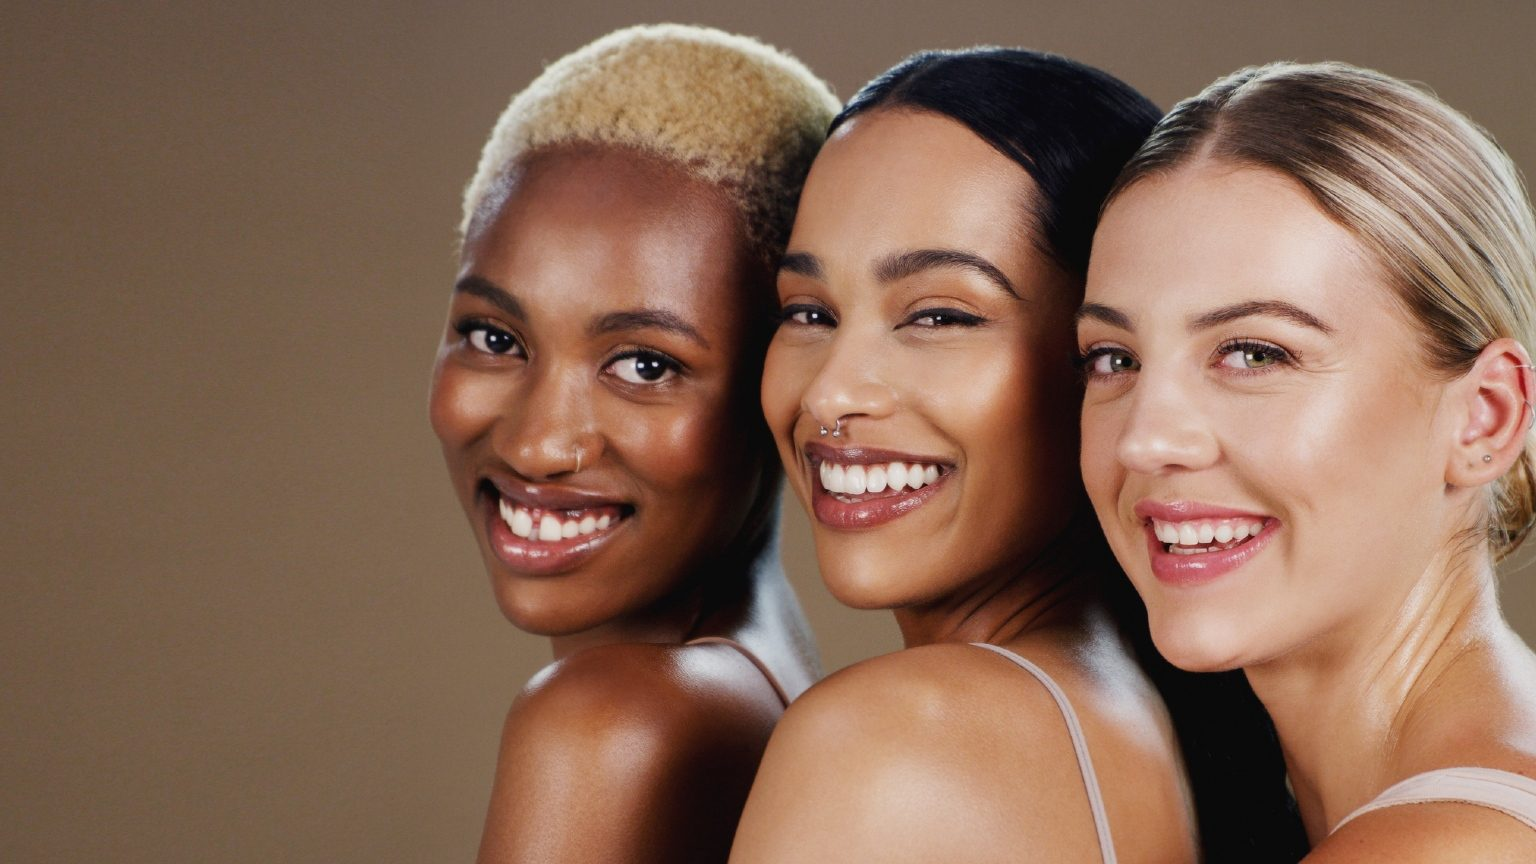 3 beautiful girls